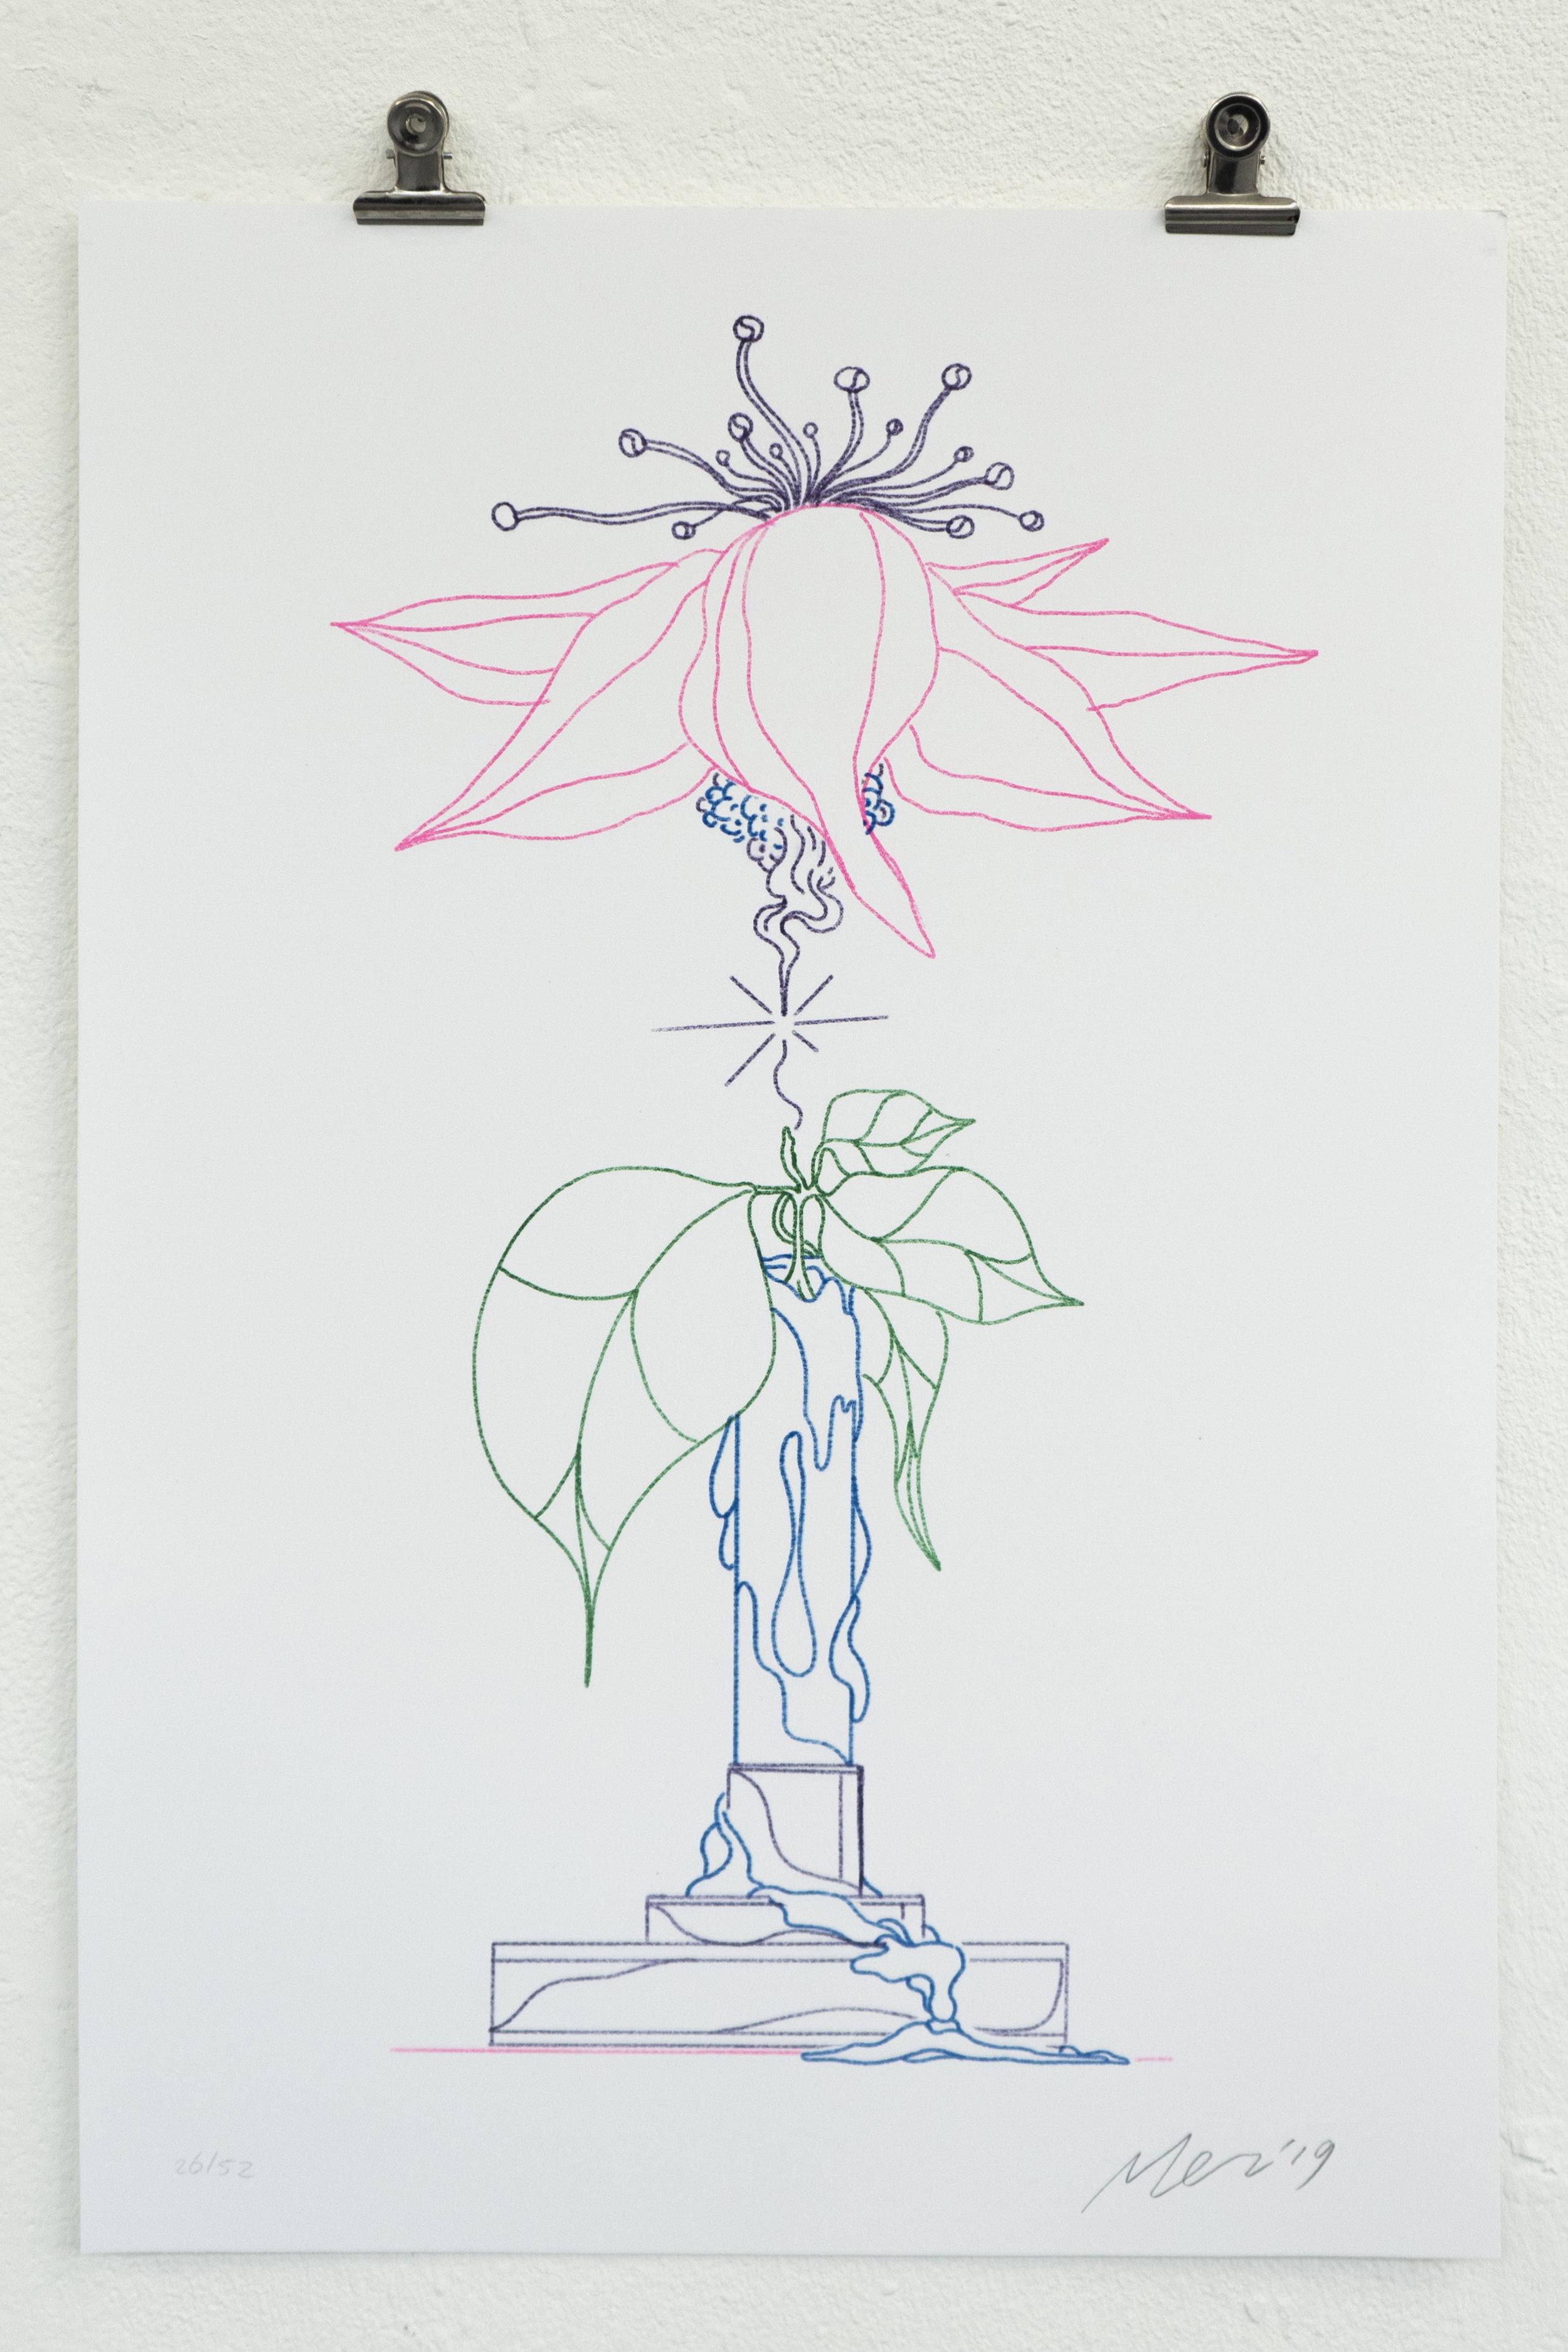 Merijn's poster for Wobby #18 - The Big Blank